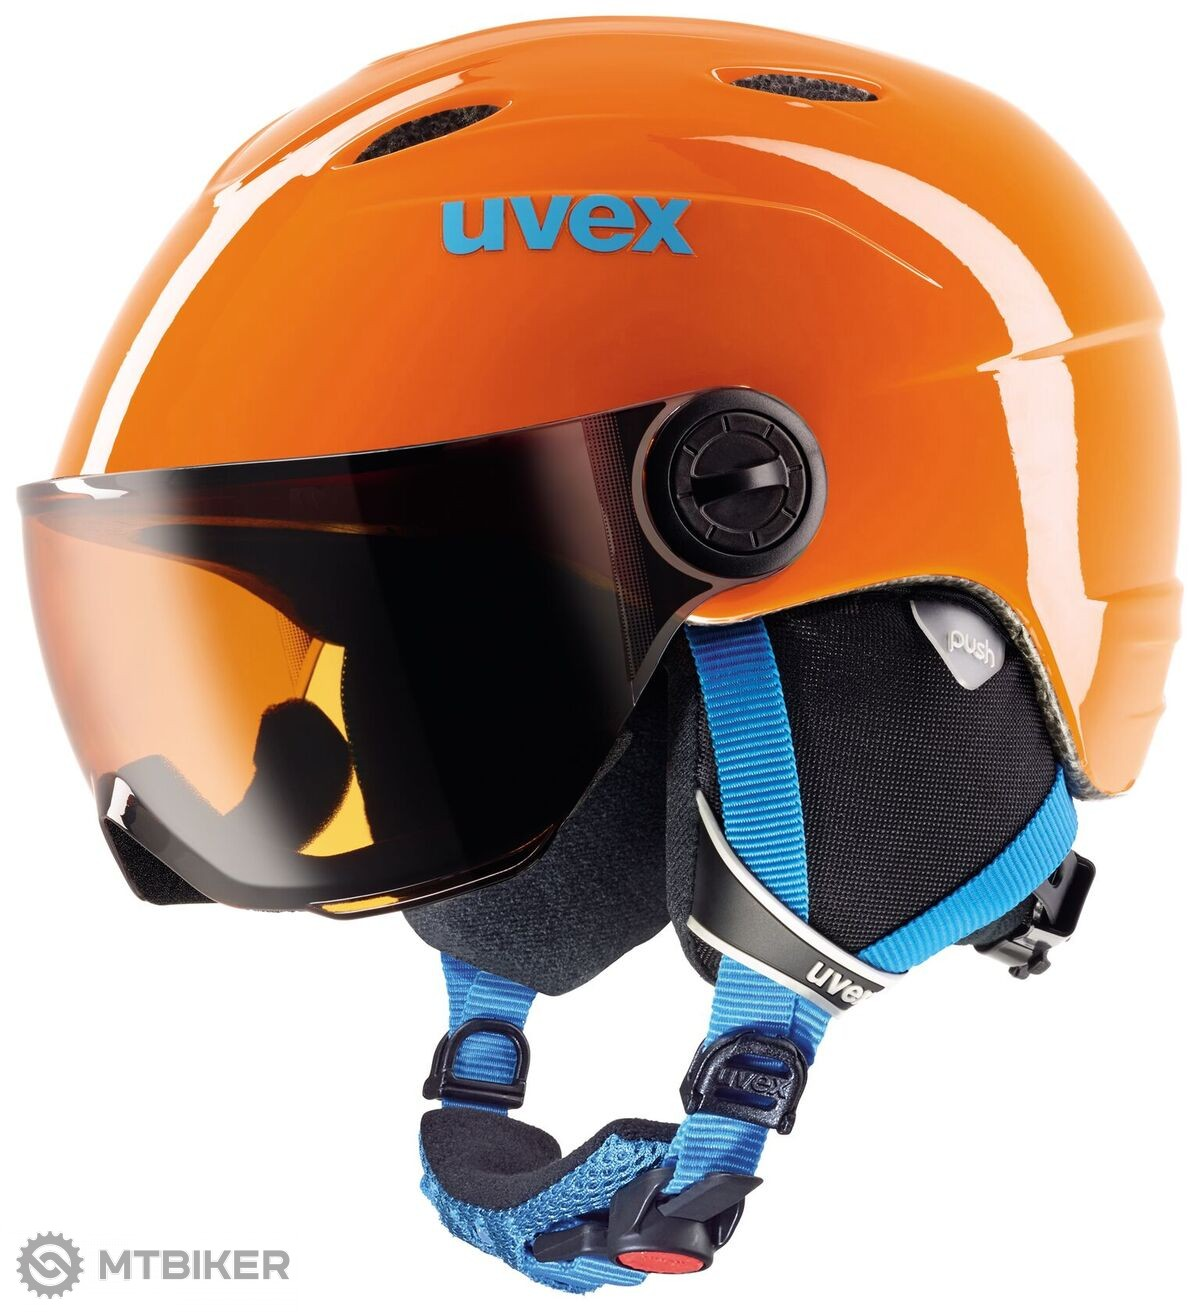 Uvex Junior Visor S566202800 detská lyžiarska helma - MTBIKER Shop 2e818207916